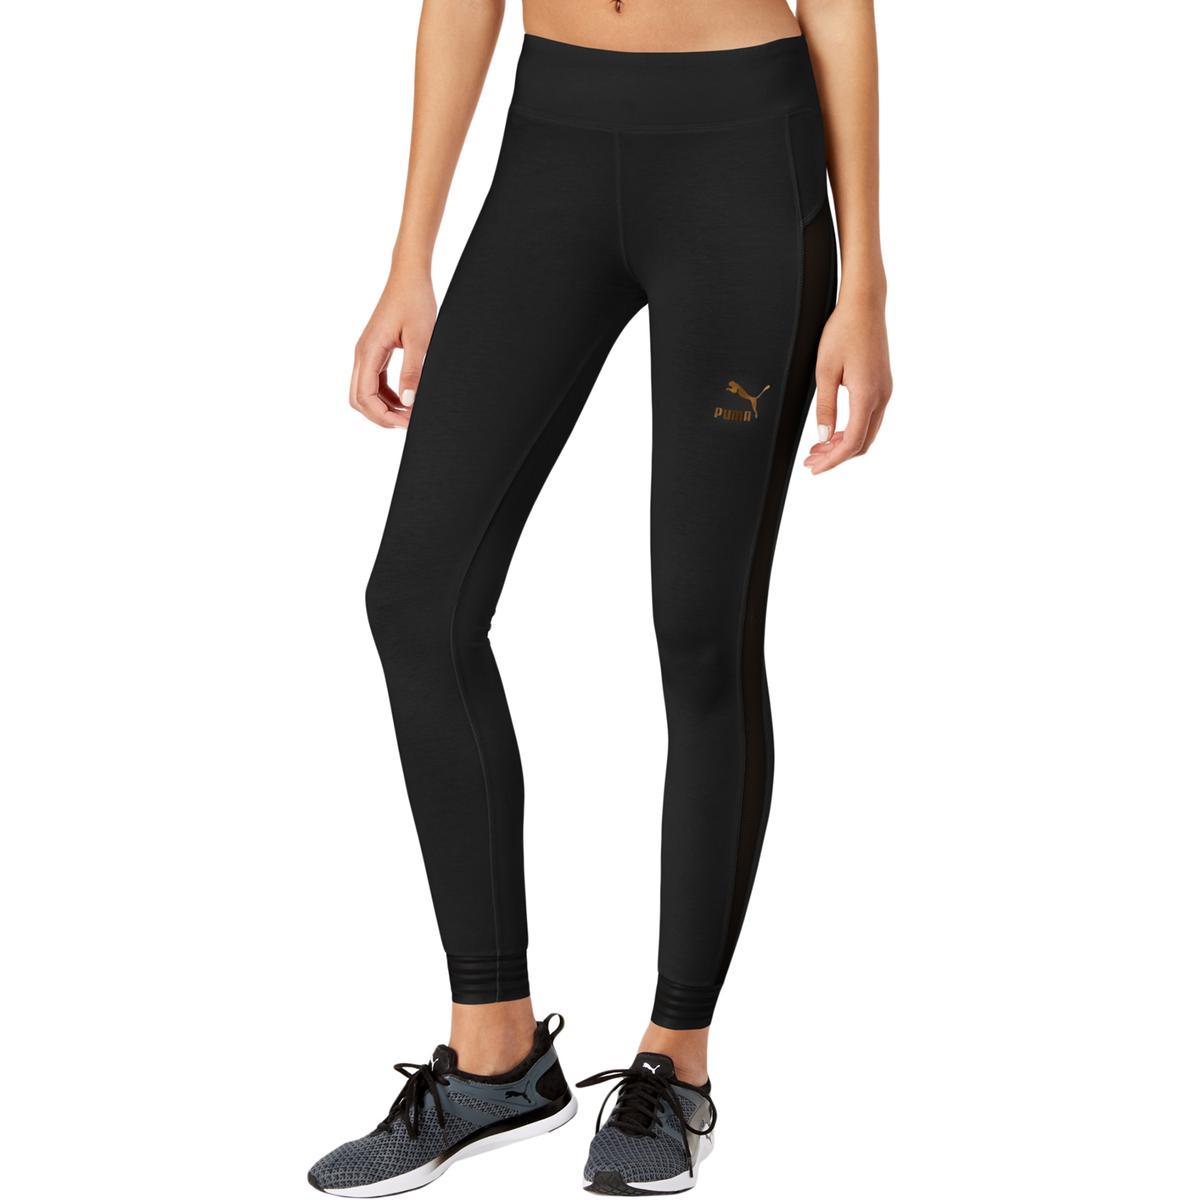 9b0665c1dbea Details about Puma Womens T7 Black Mesh Trimmed Stripe Fitted Athletic  Leggings L BHFO 4903